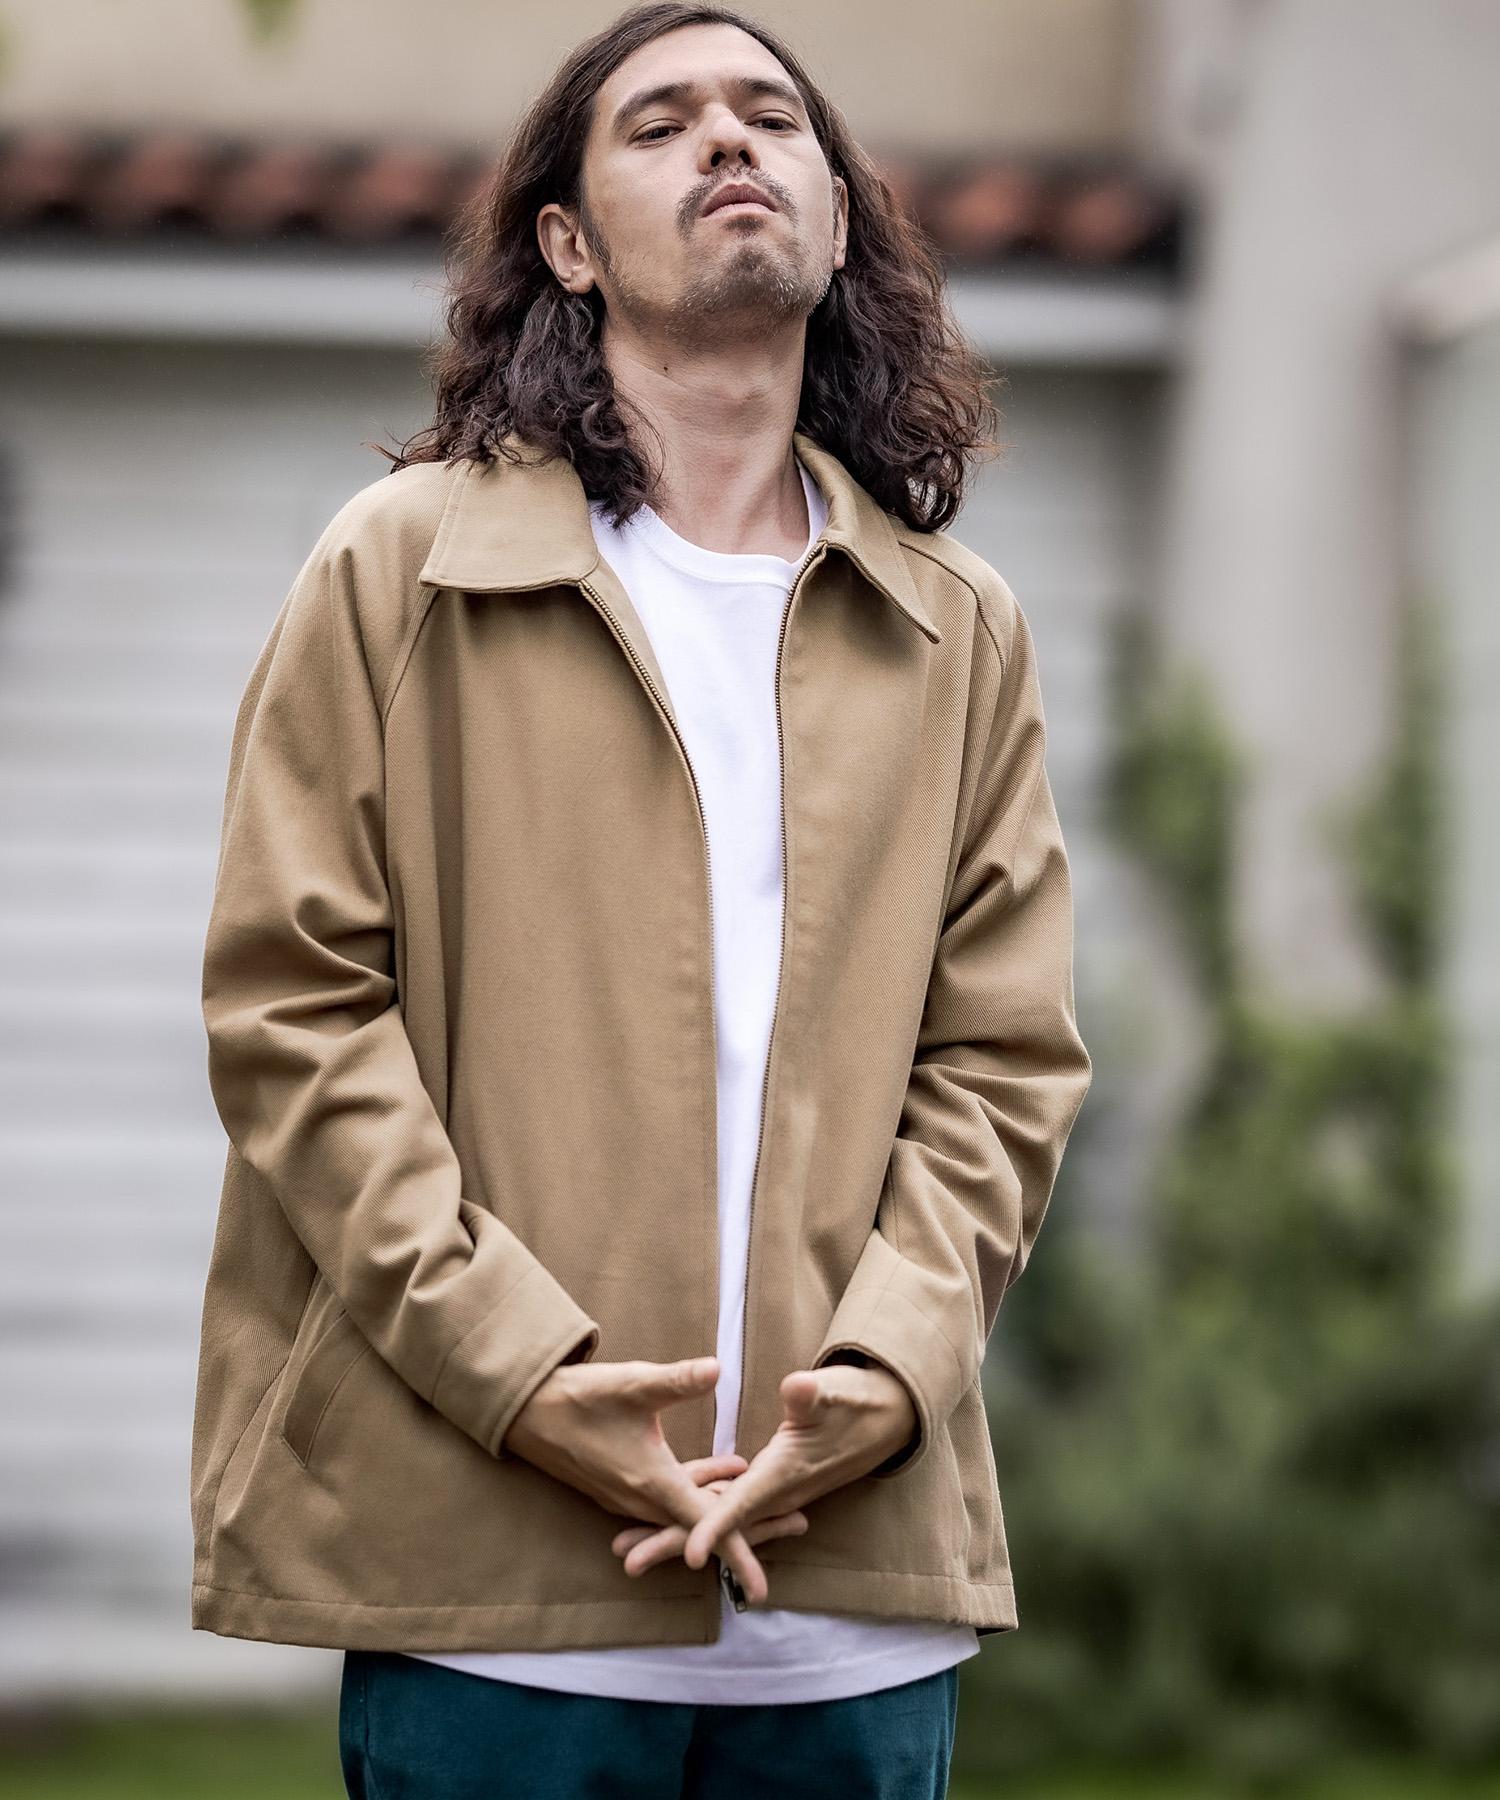 【CAMBIO(カンビオ)】【予約販売9月下旬~10月上旬入荷】Over Size Swing Top Jacket ジャケット(CAM20AW-007)